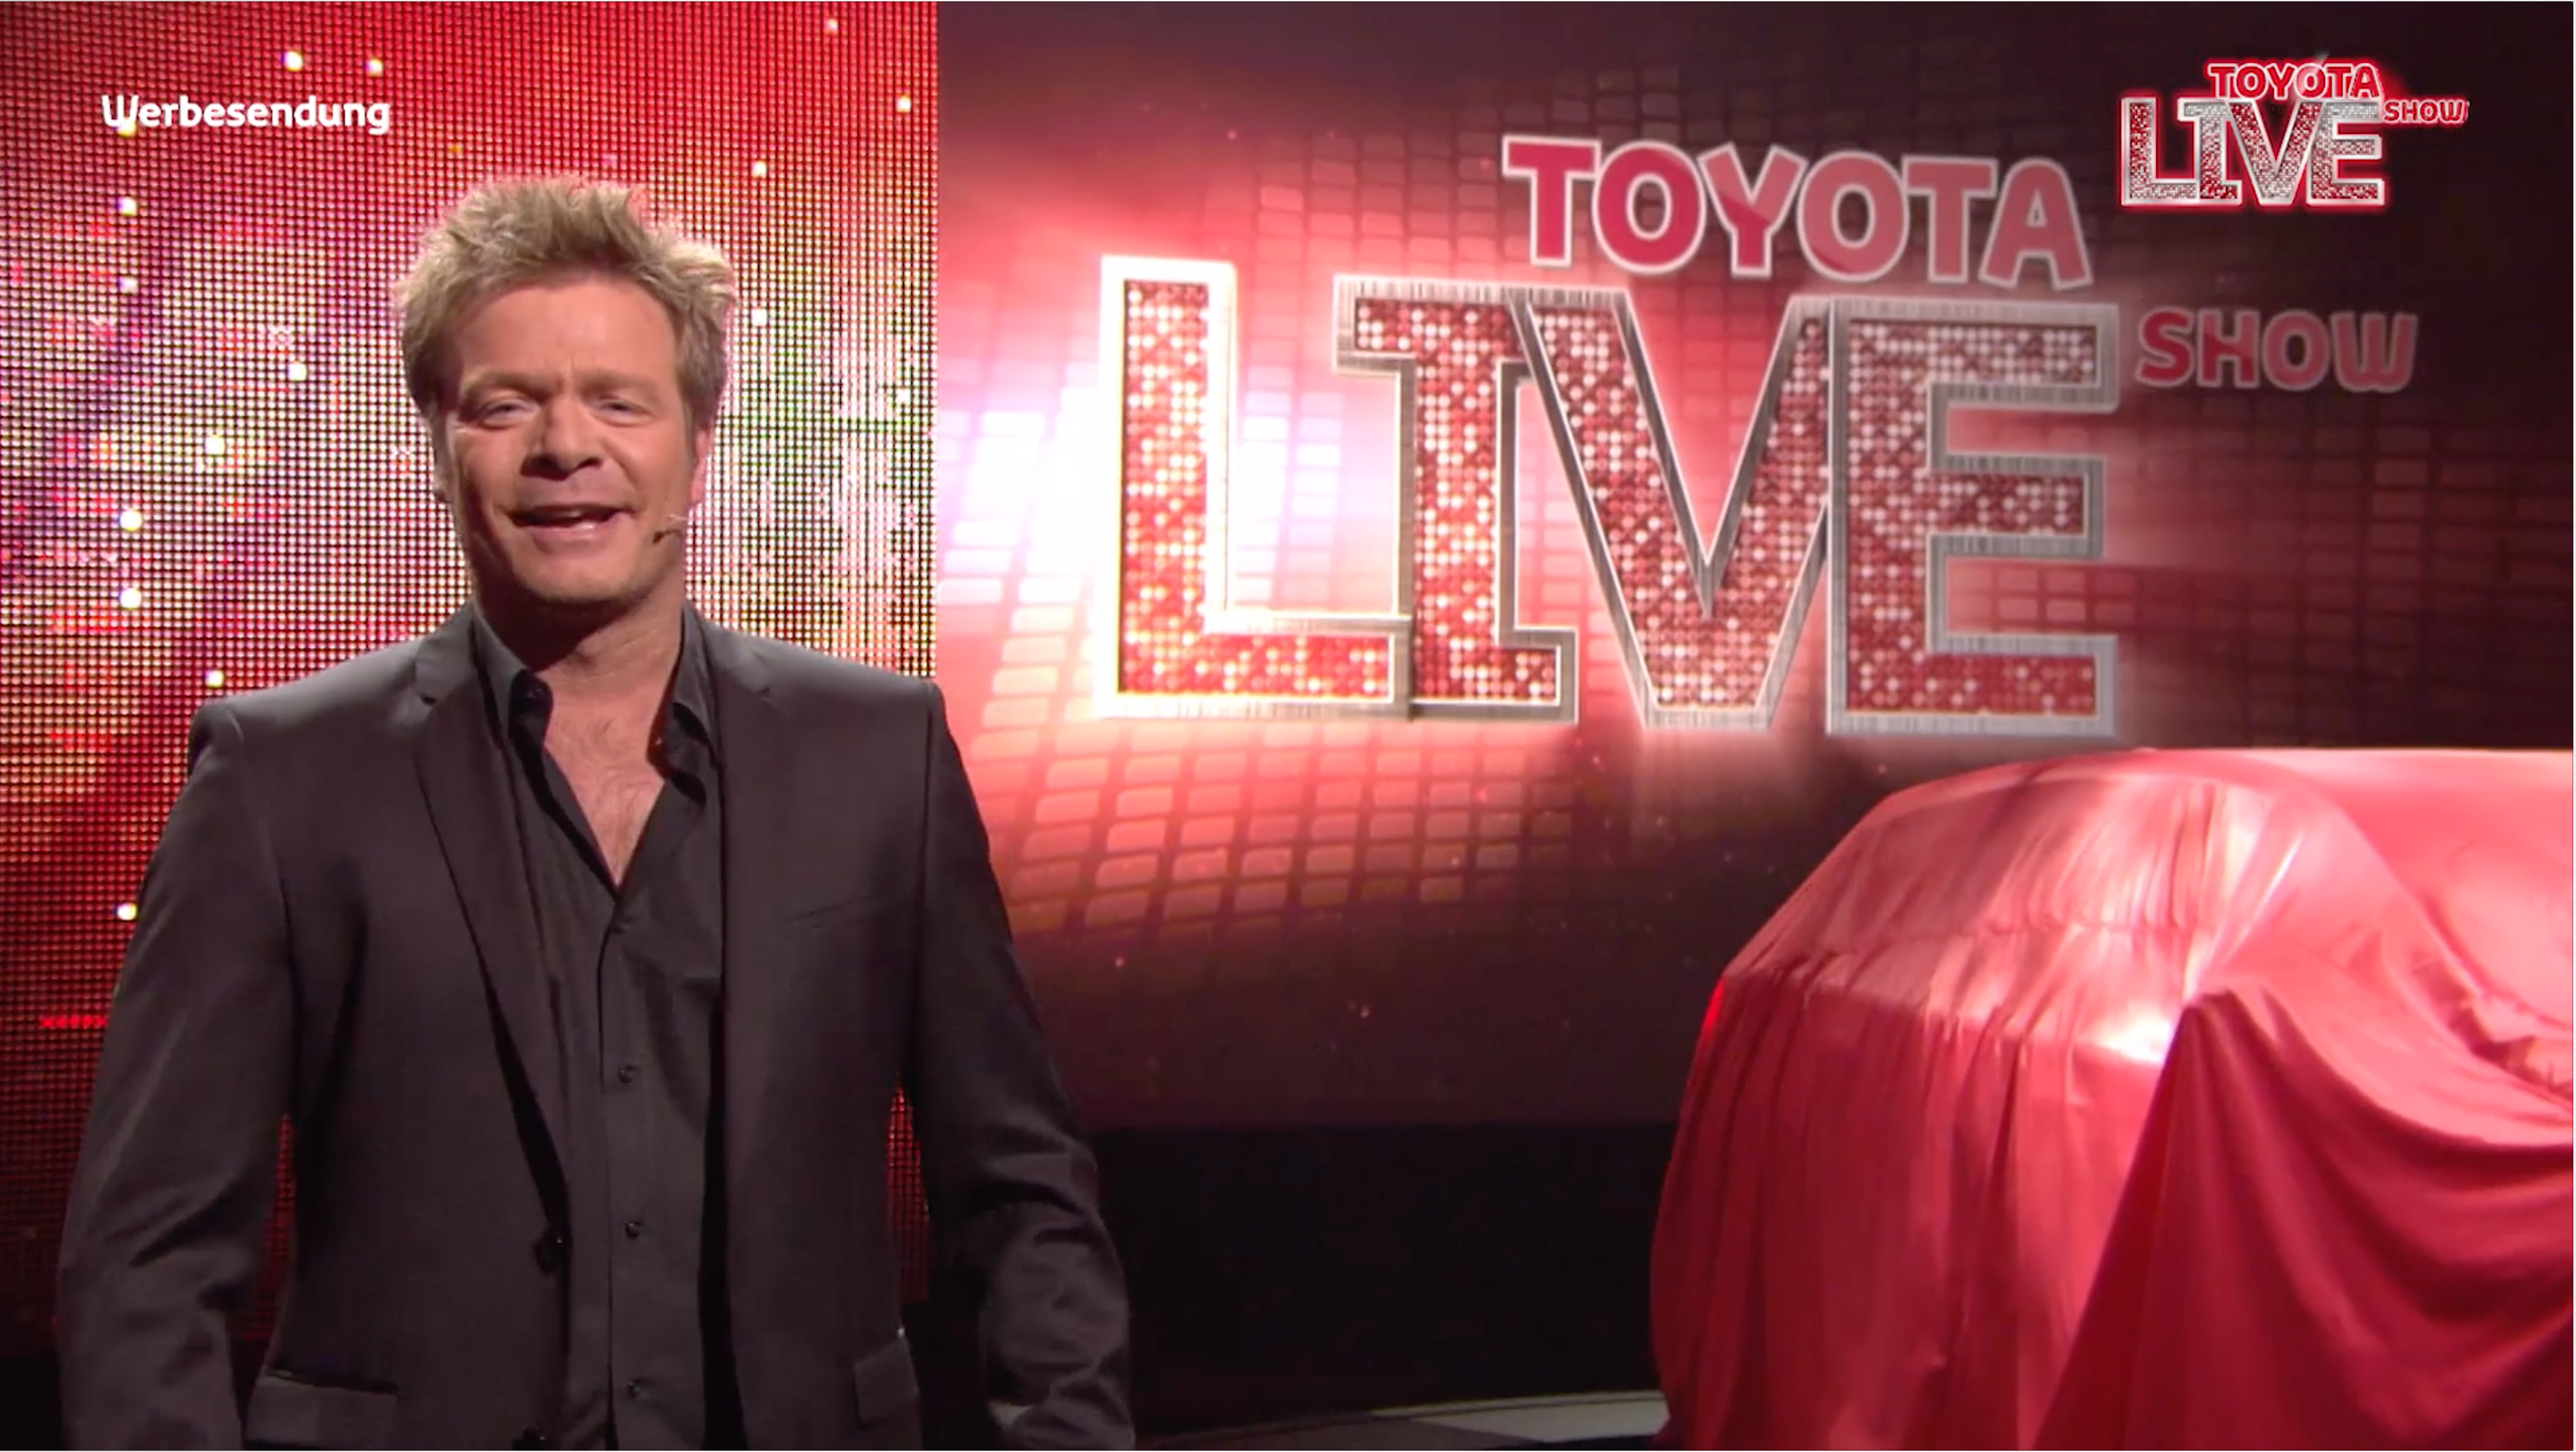 Toyota: Toyota LIVE